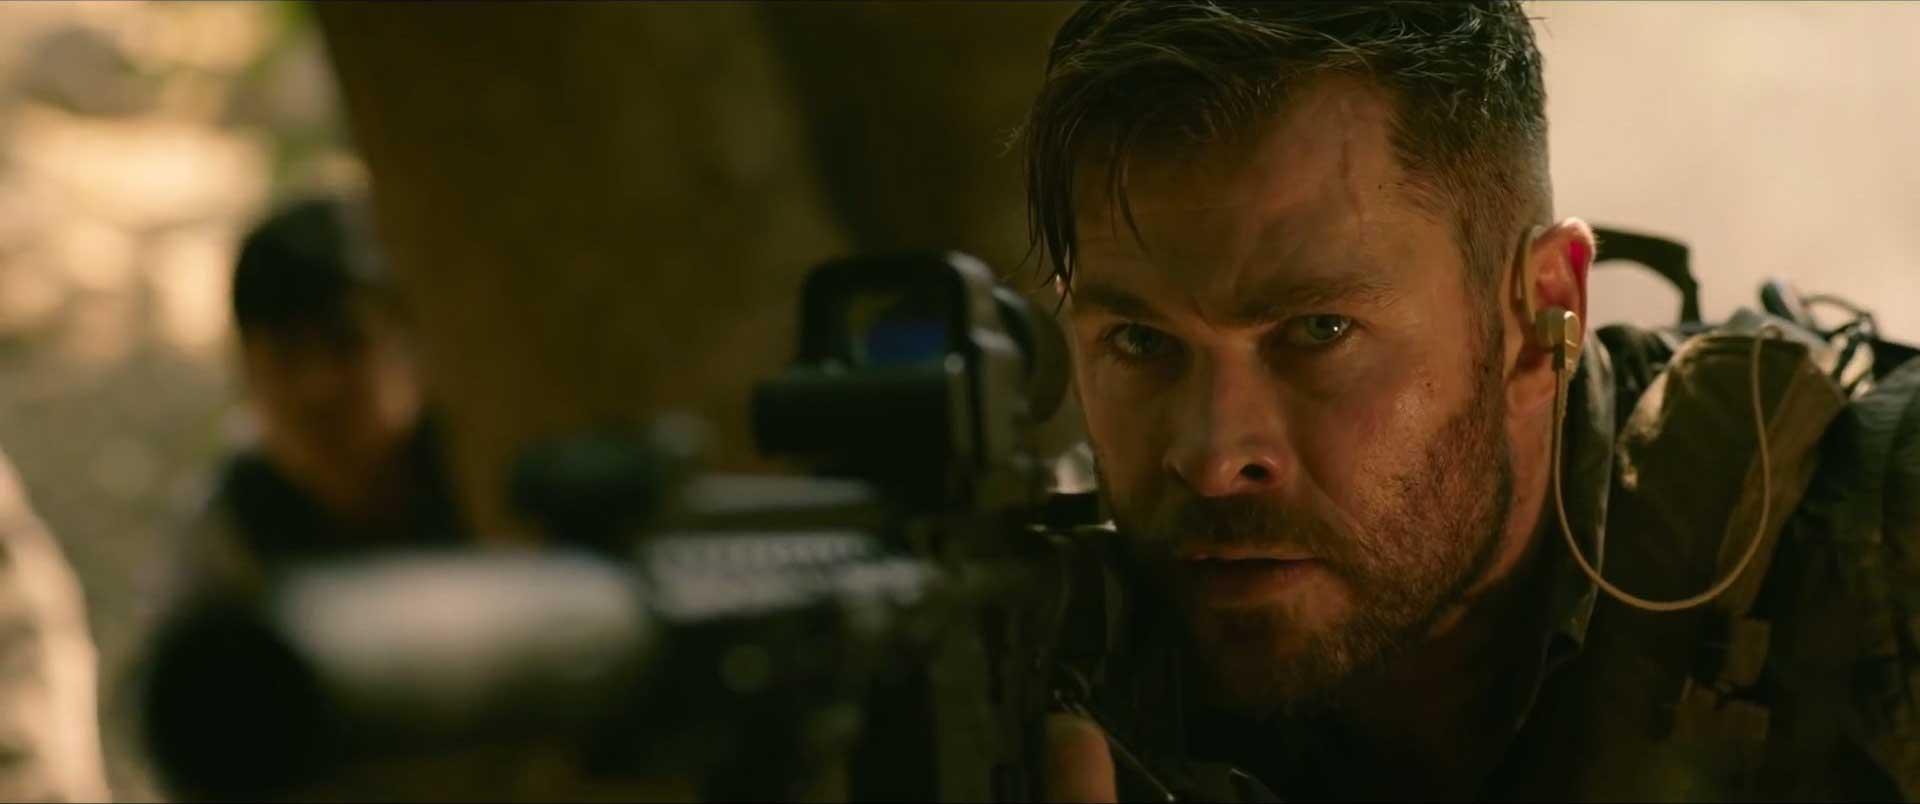 Chris Hemsworth S Netflix Film Extraction Set In India Gets A High Octane Trailer Appocalypse